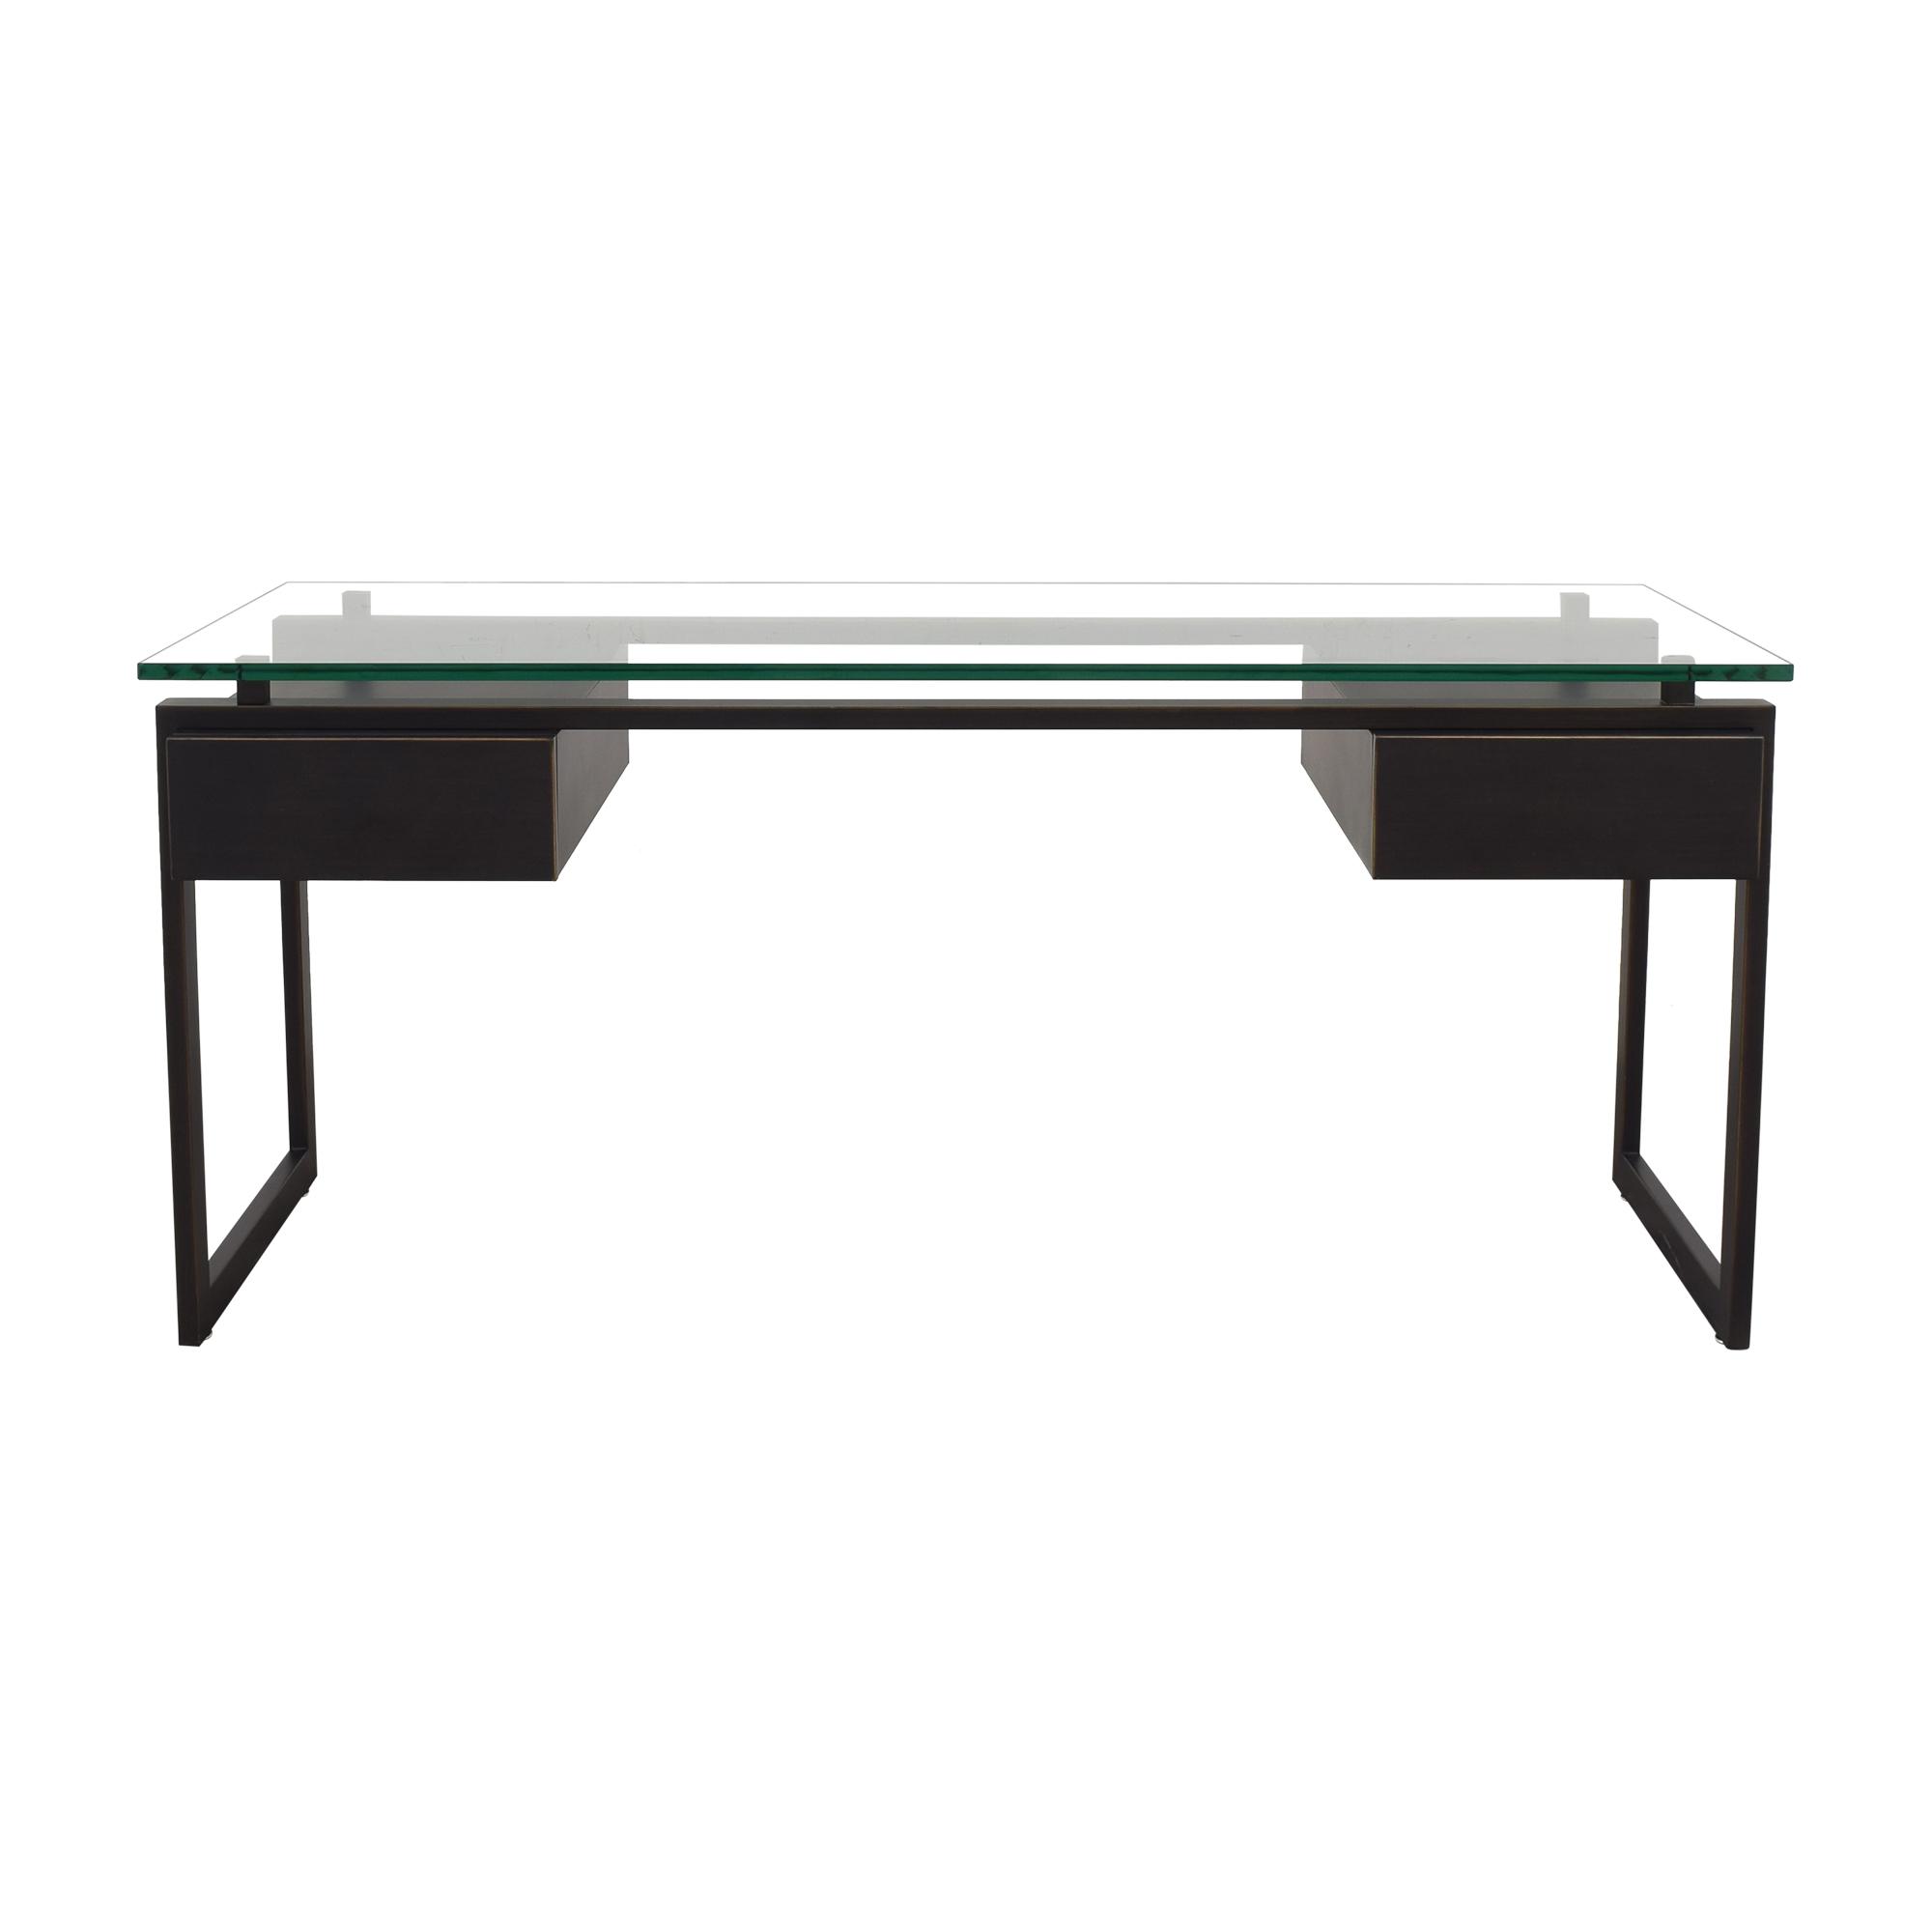 Restoration Hardware Latour Desk / Tables